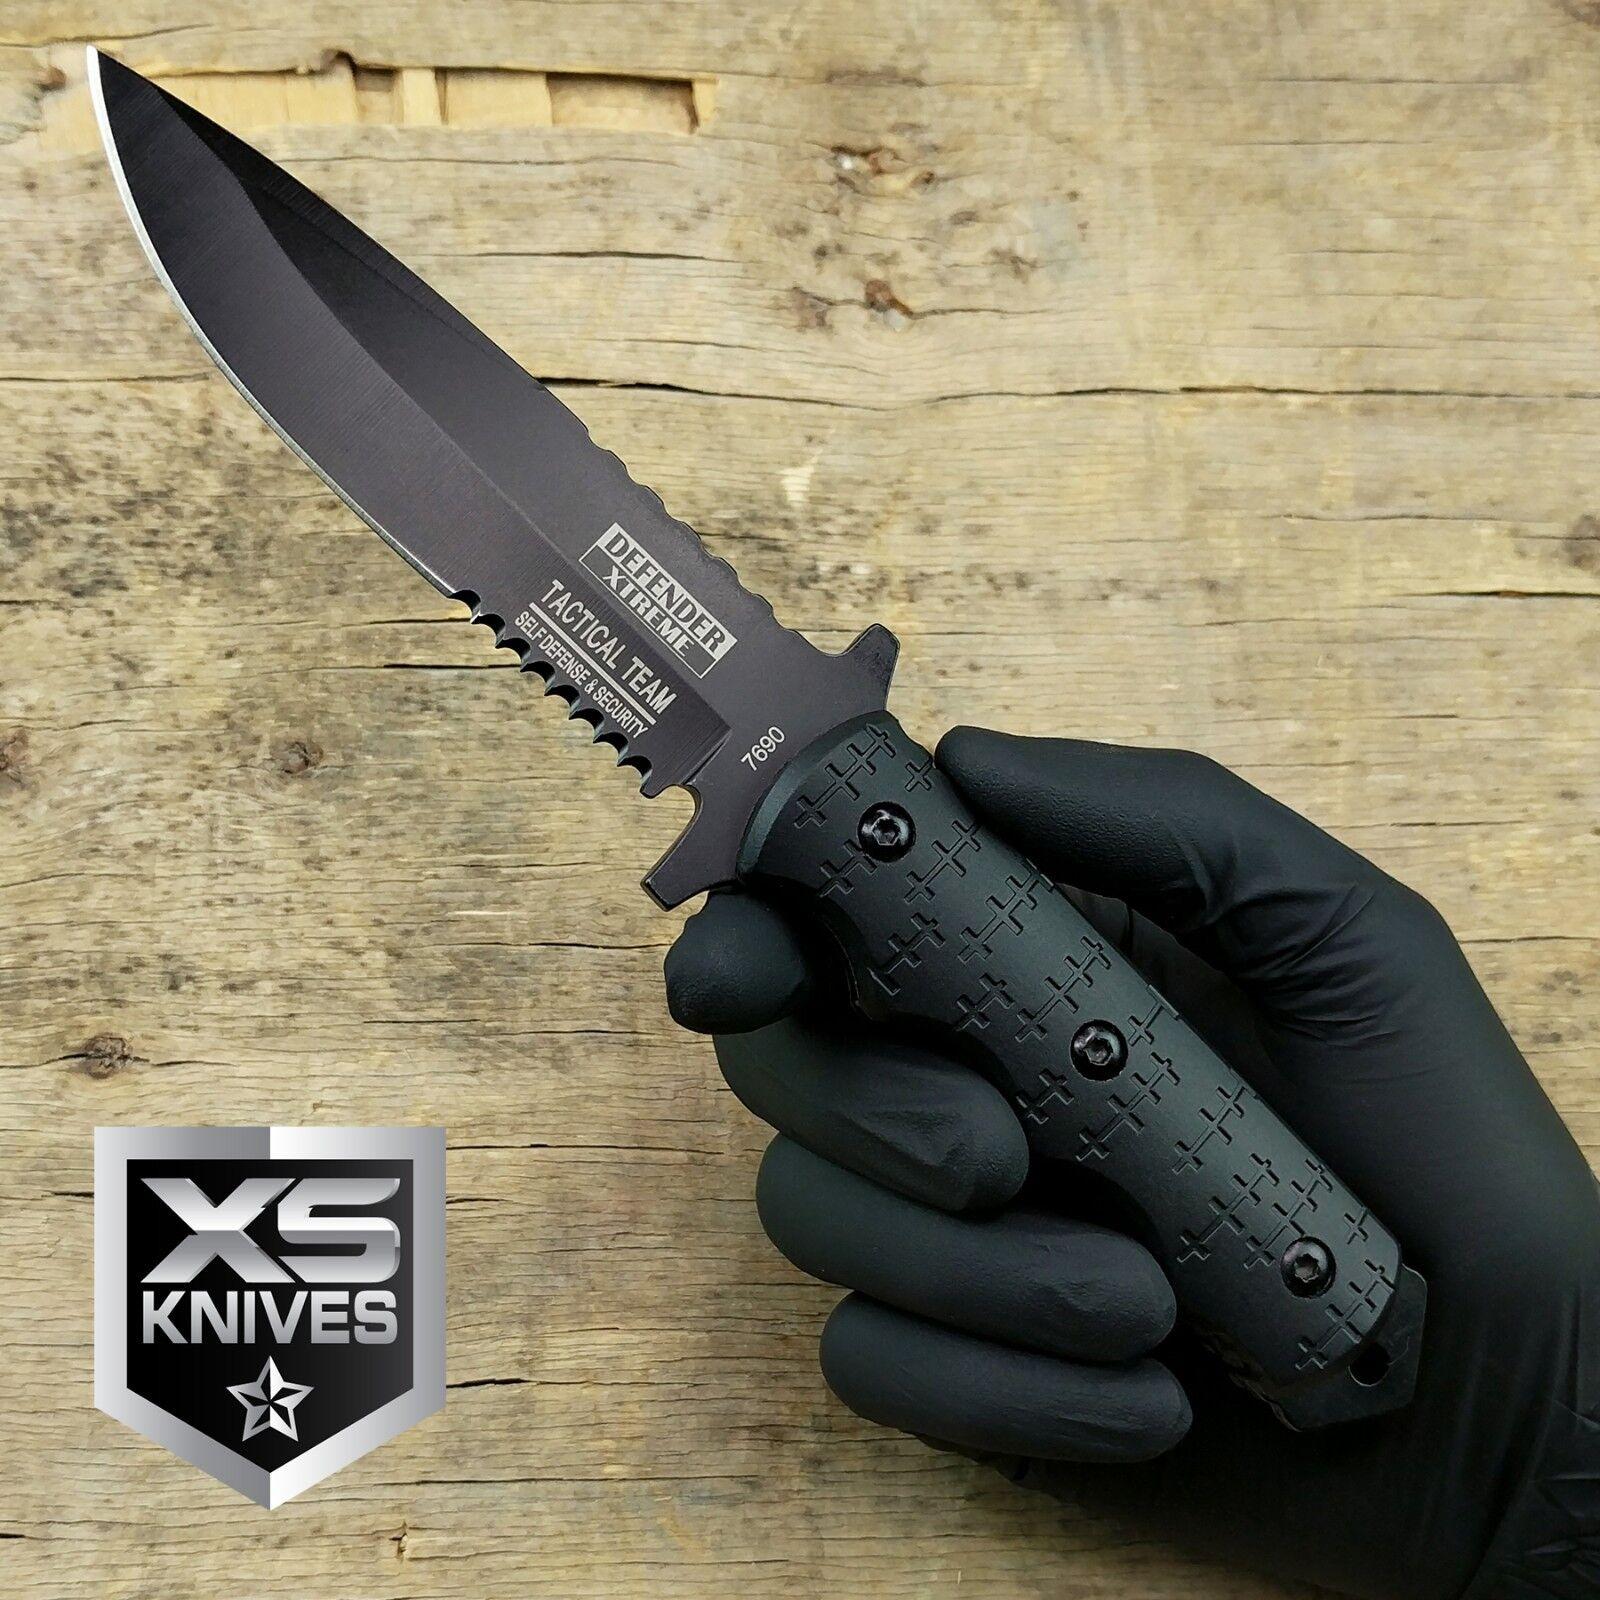 9 Quot Navy Seals Tactical Combat Bowie Knife W Sheath